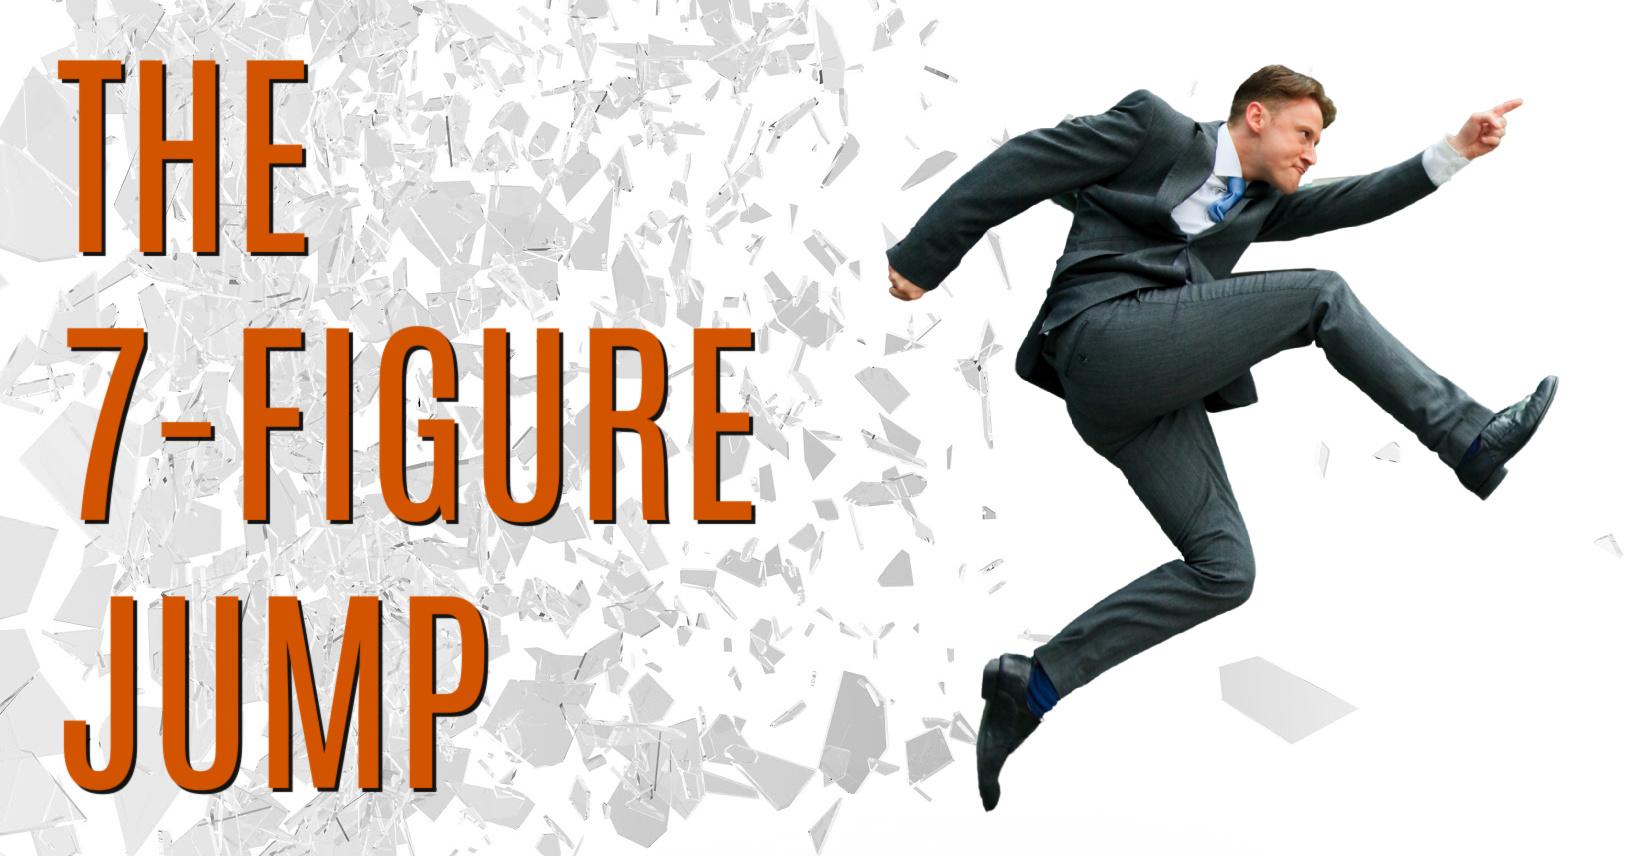 Seve Figure Jump Cover image